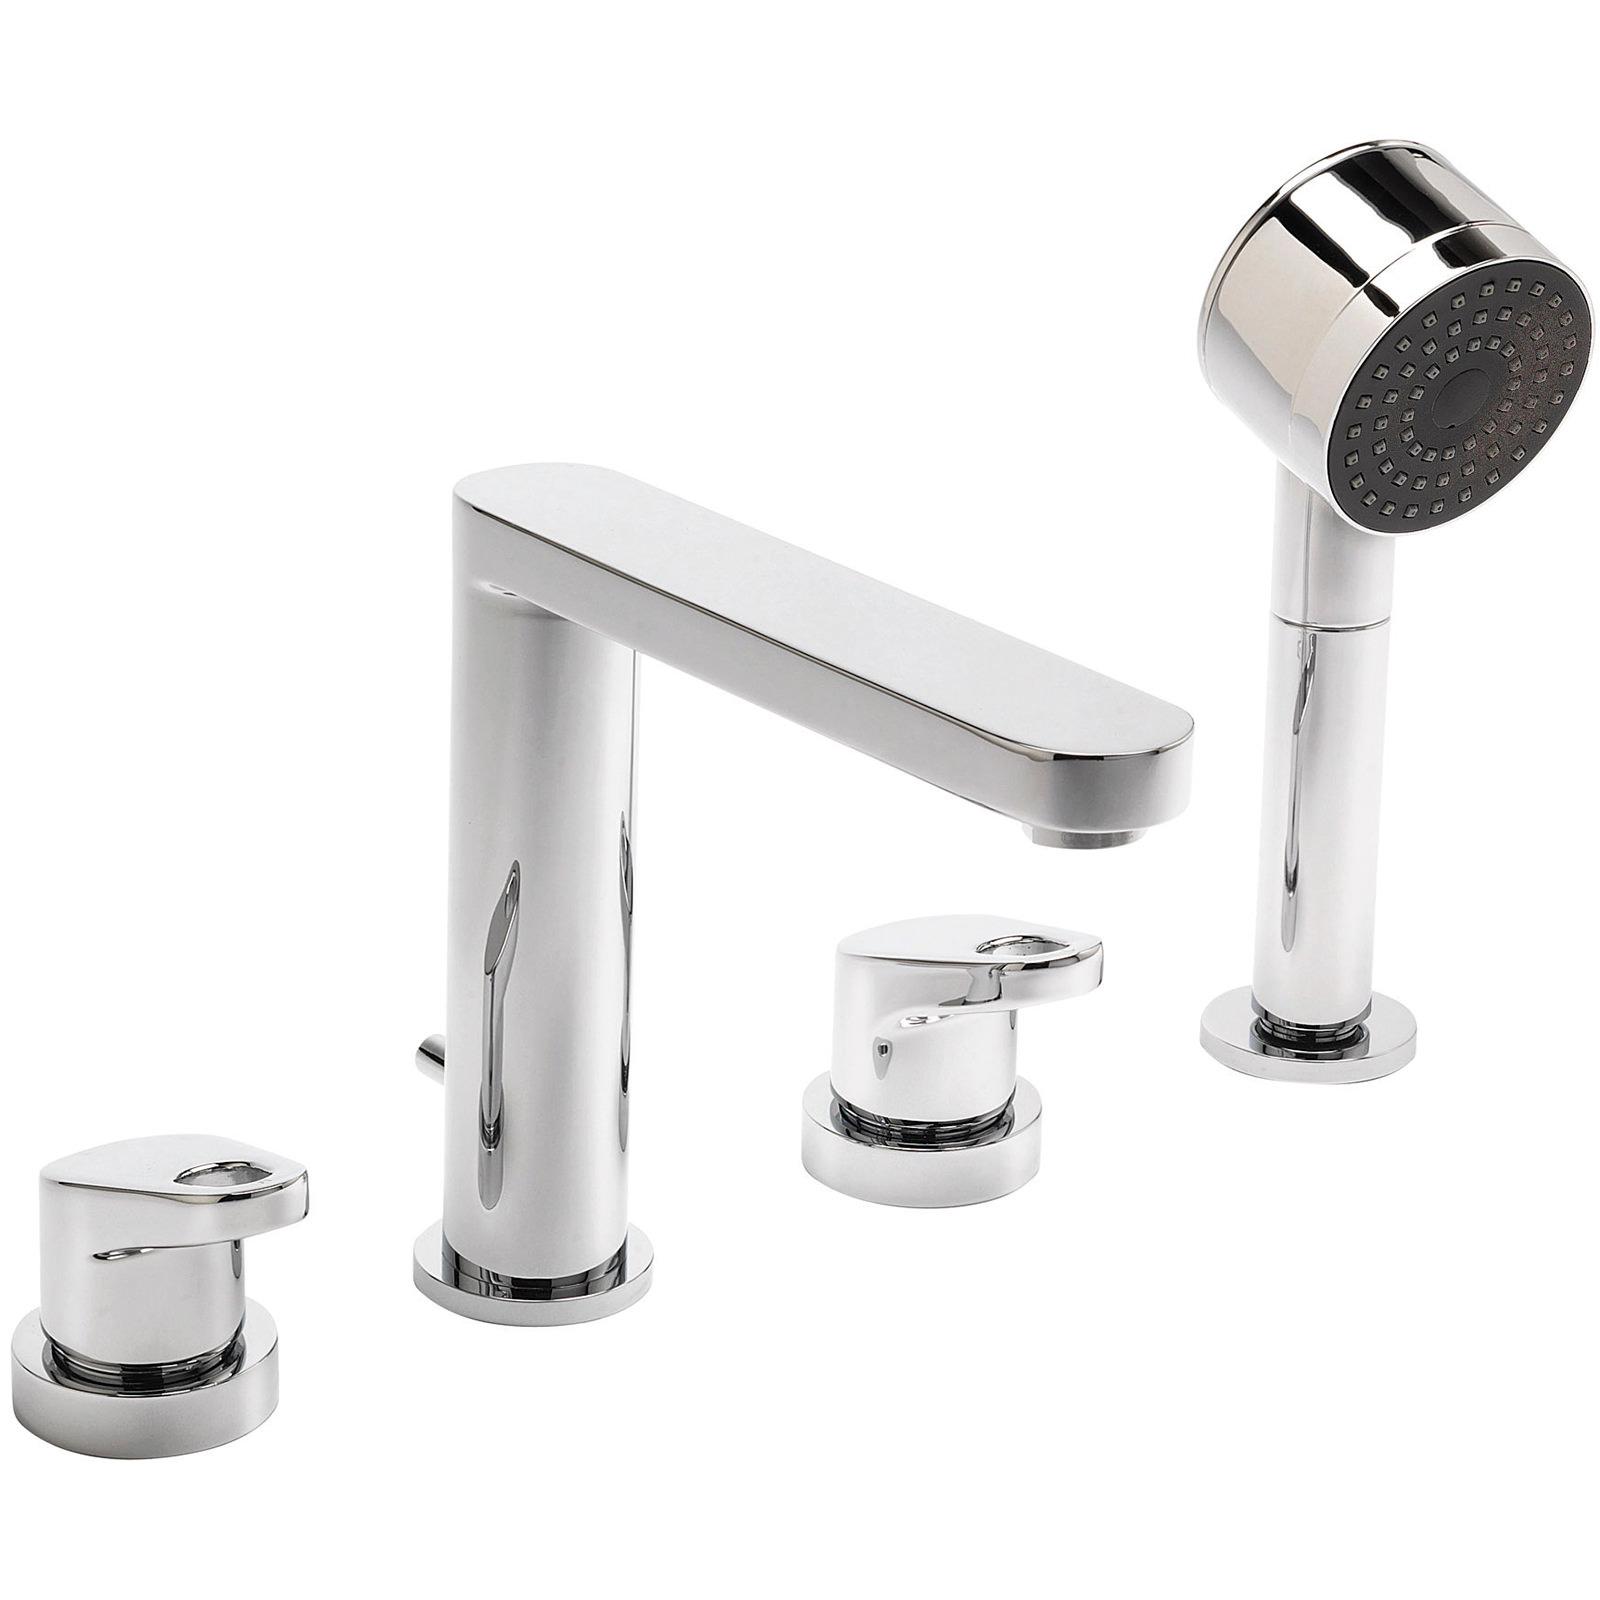 Sagittarius Vento 4 Hole Deck Mounted Bath Shower Mixer Tap